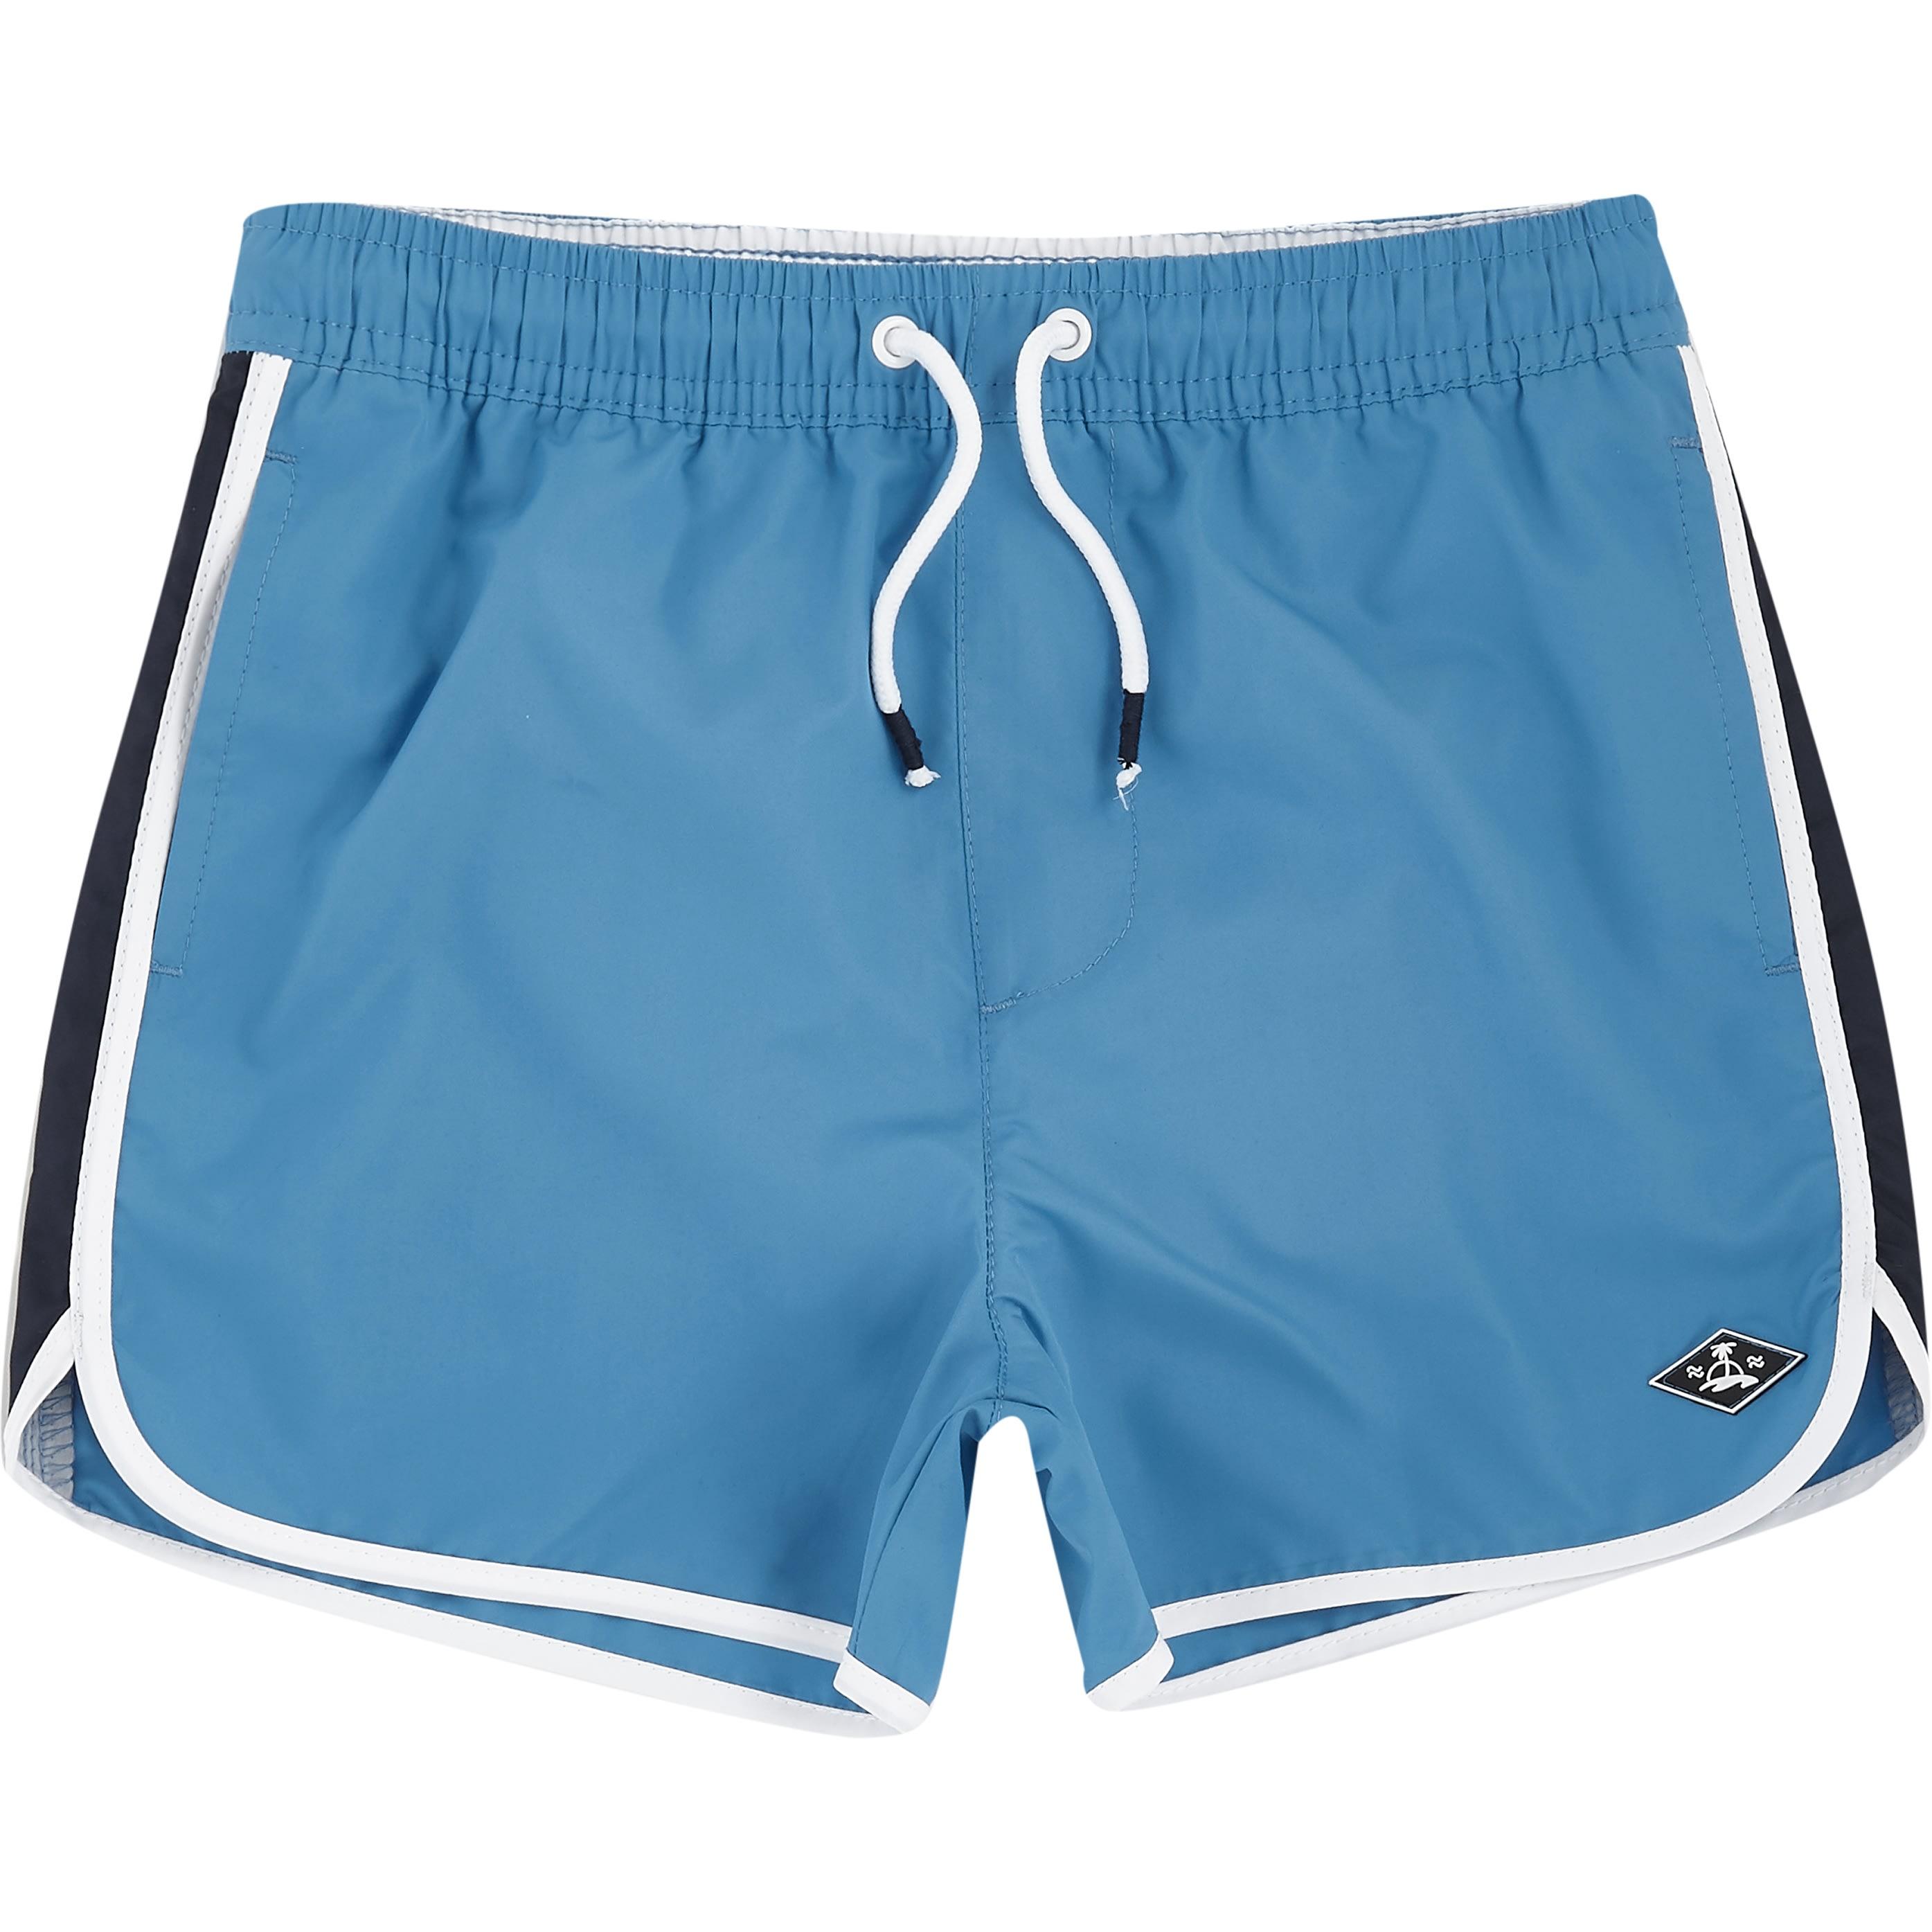 River Island - mens river island   runner swim shorts - 1